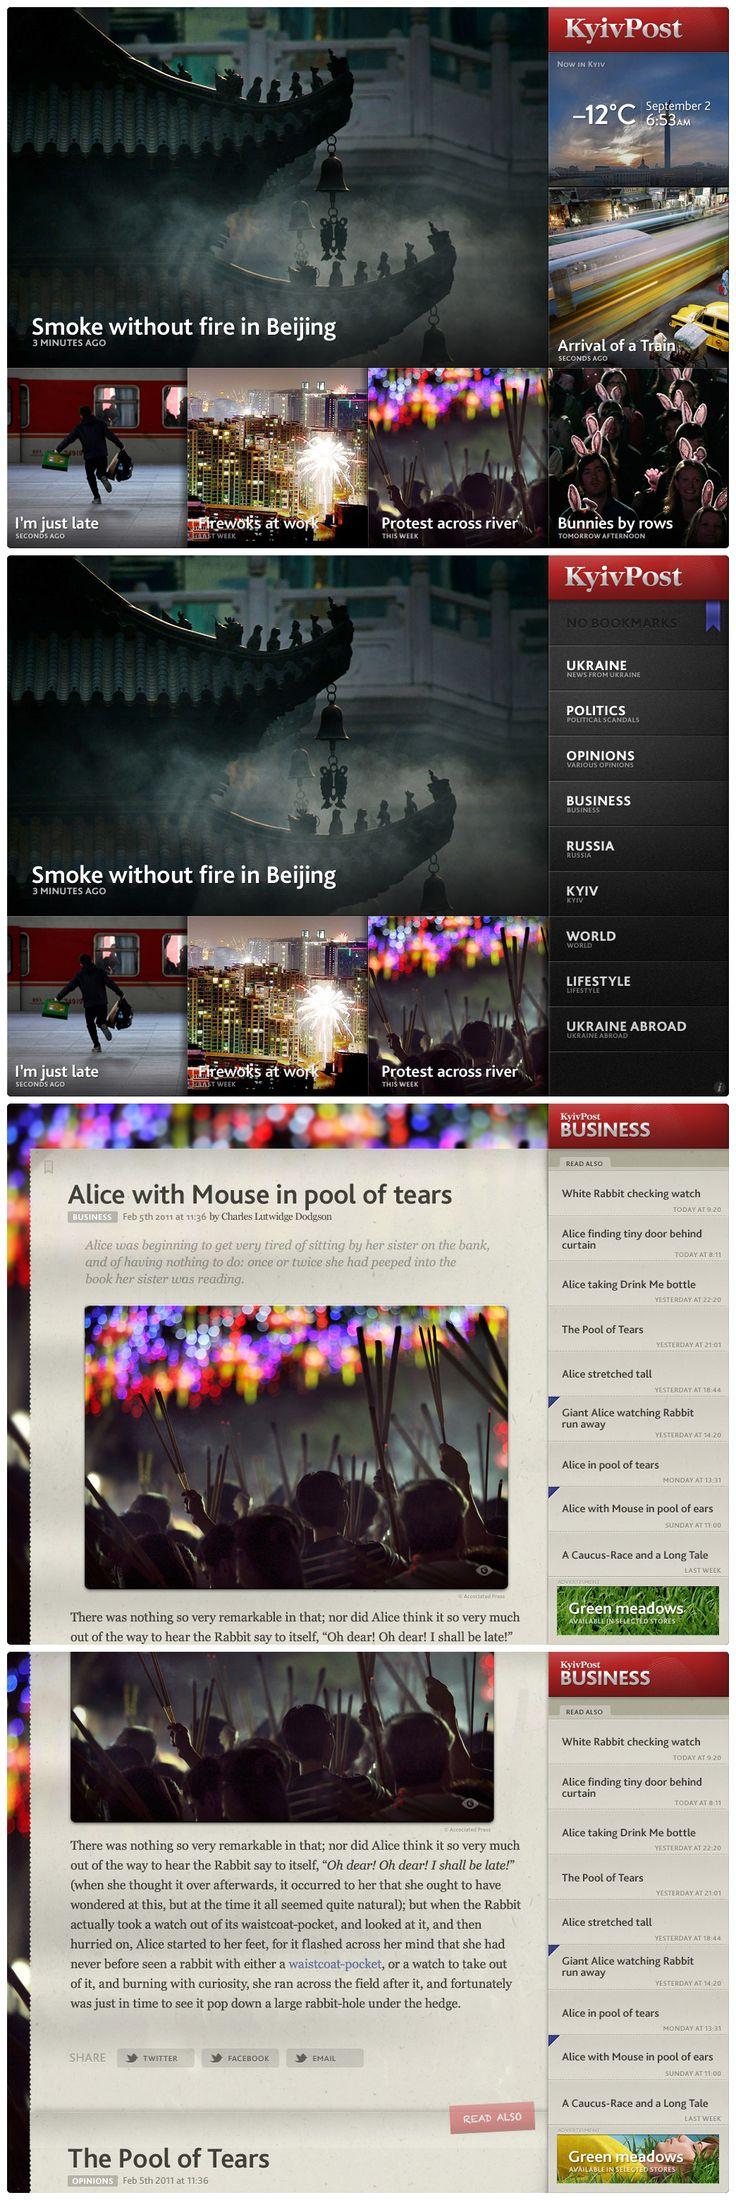 KyivPost HD. Новостное приложение для iPad (2011)